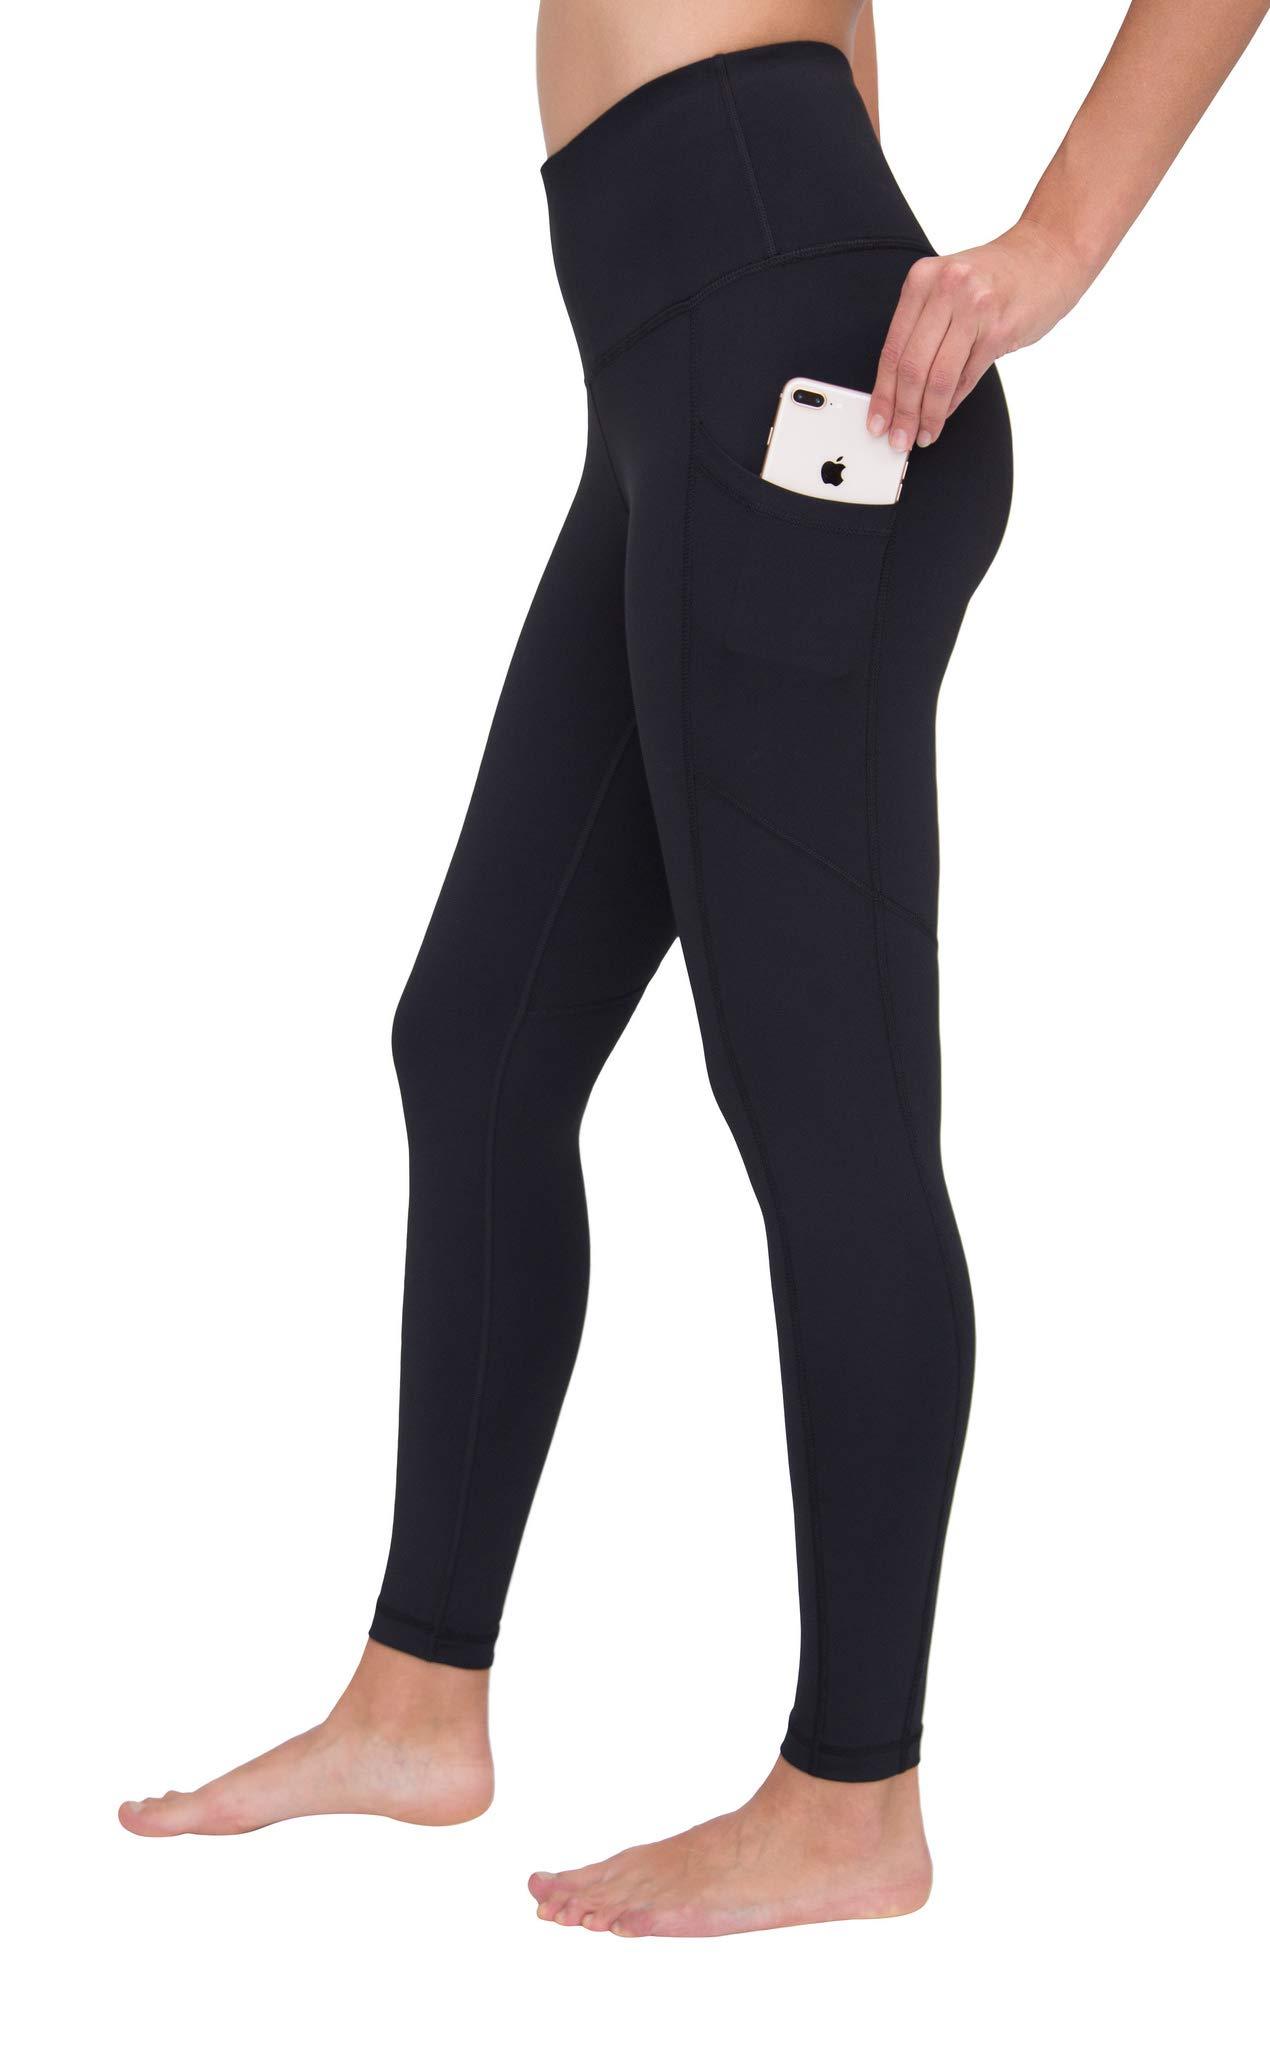 90 Degree By Reflex Women's Power Flex Yoga Pants - Black 2019 - XL by 90 Degree By Reflex